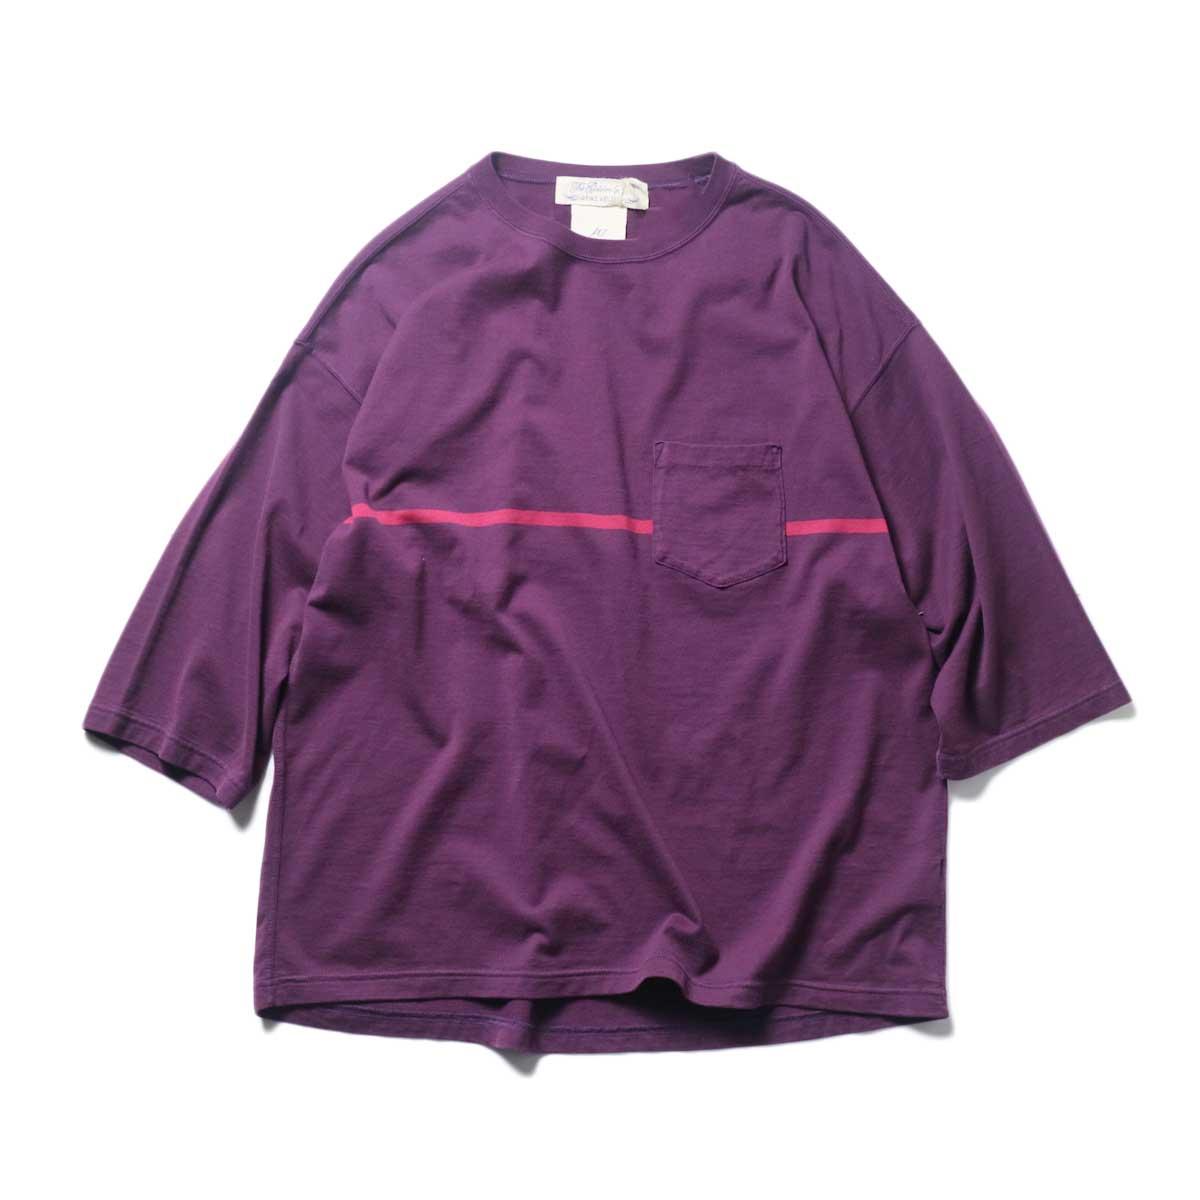 REMI RELIEF / 24Gパネル胸ボーダー七分袖 (Purple)